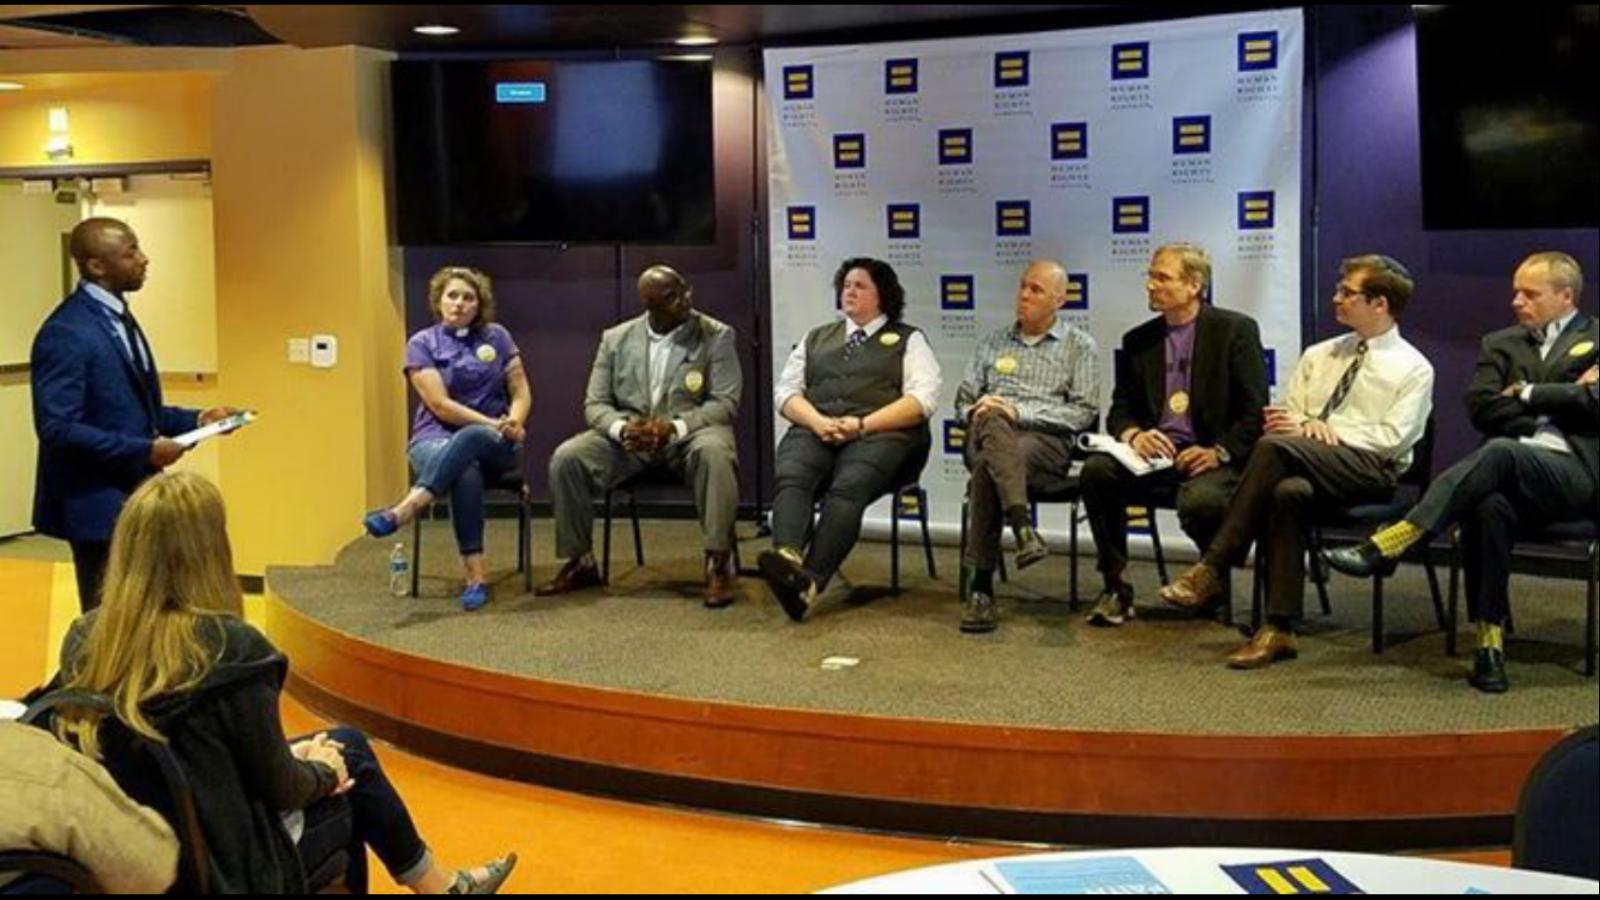 HRC Mississippi Hosts First Interfaith Symposium